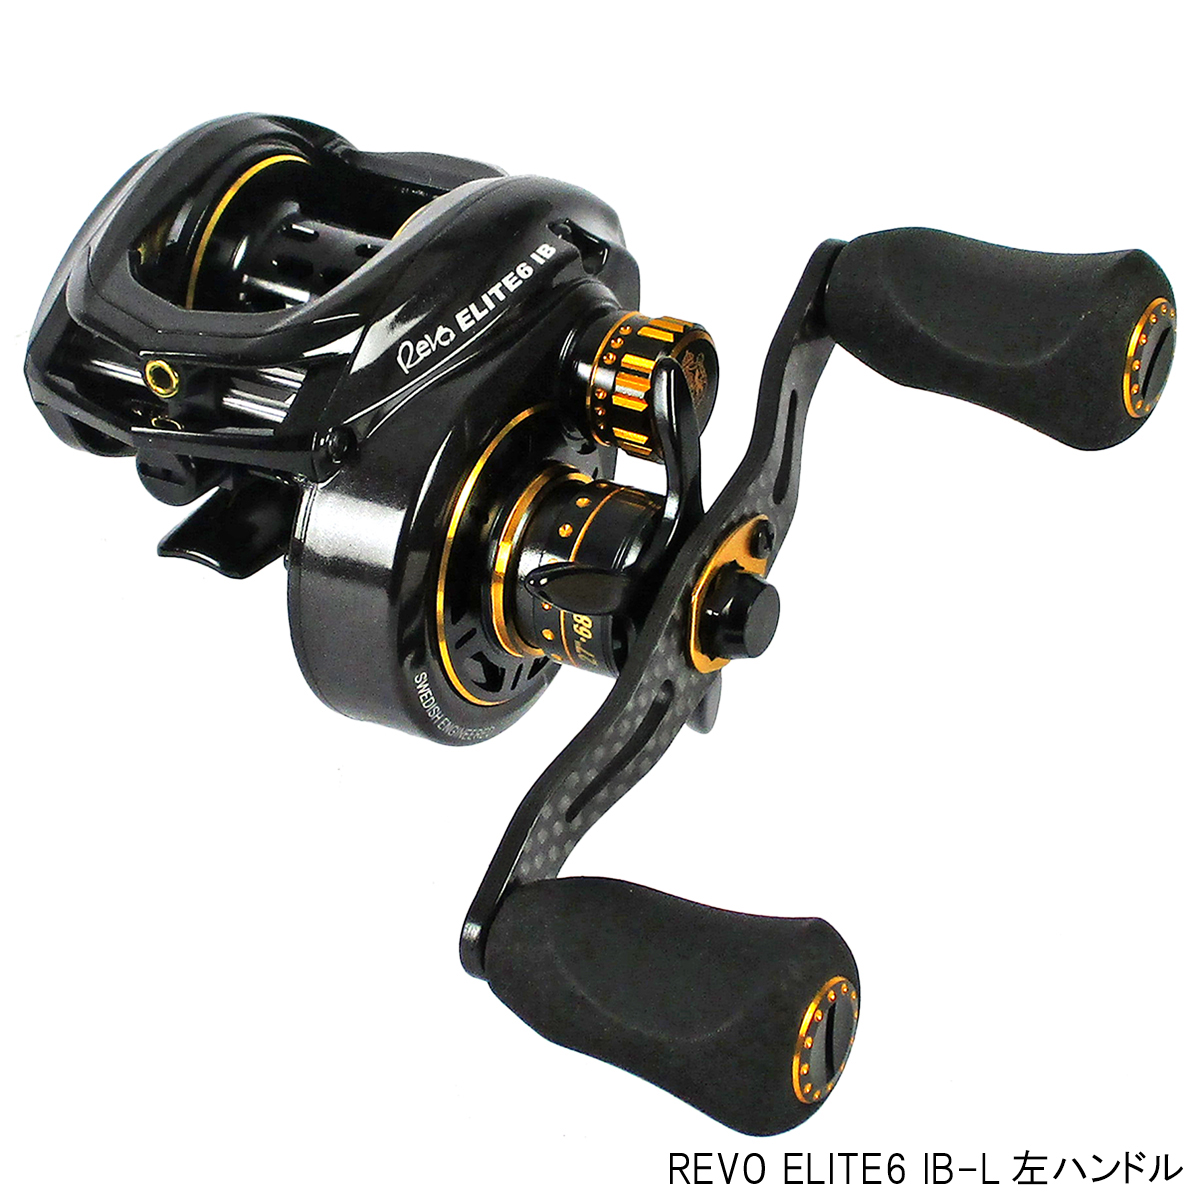 REVO ELITE6 IB-L 左ハンドル(東日本店)